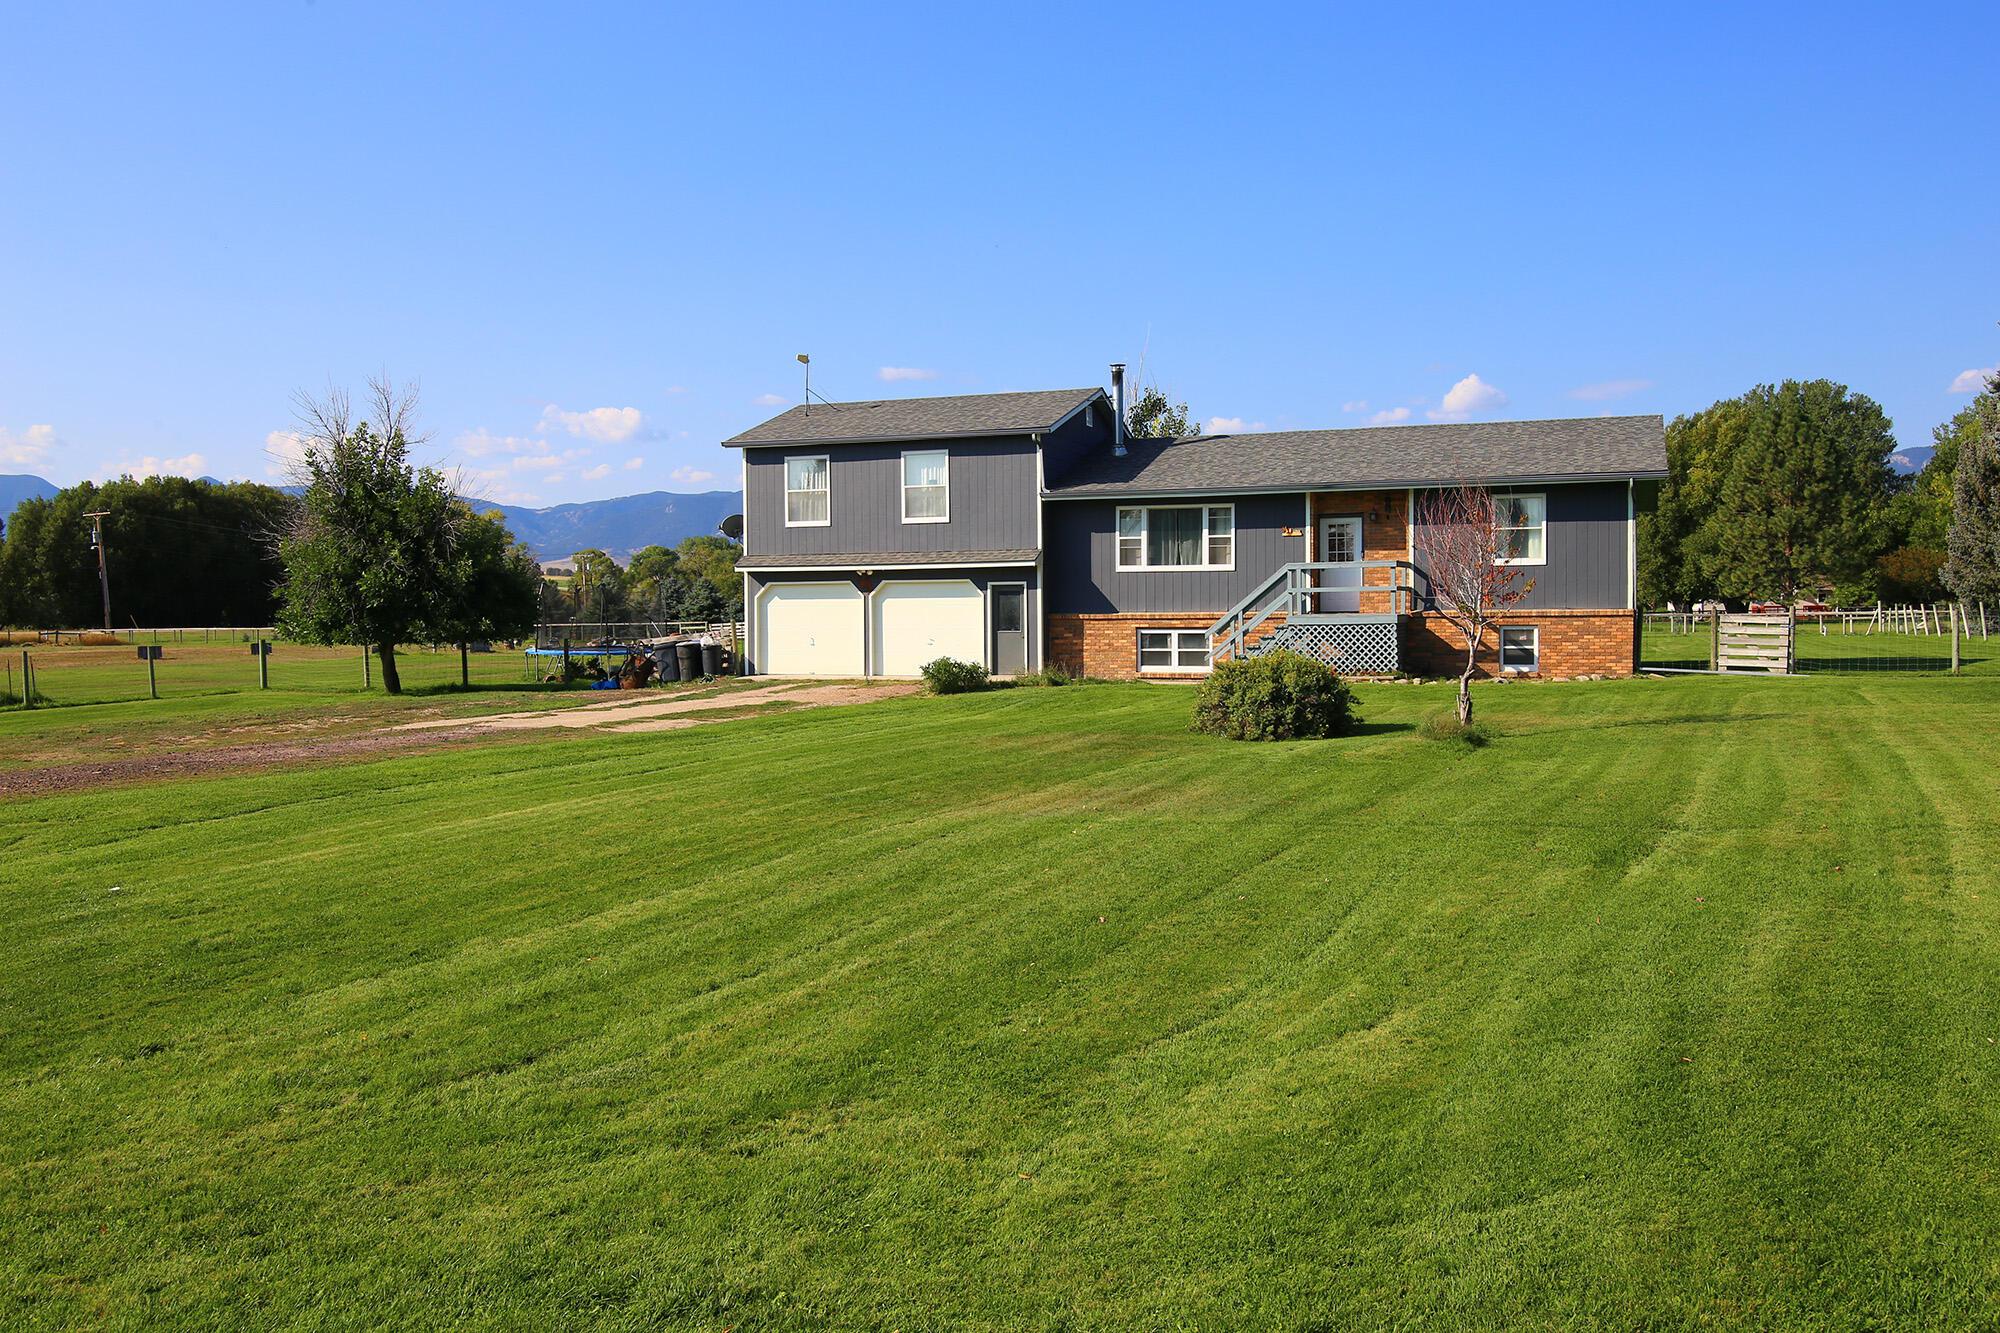 4 Timm Street, Sheridan, Wyoming 82801, 4 Bedrooms Bedrooms, ,2 BathroomsBathrooms,Residential,For Sale,Timm,21-1046